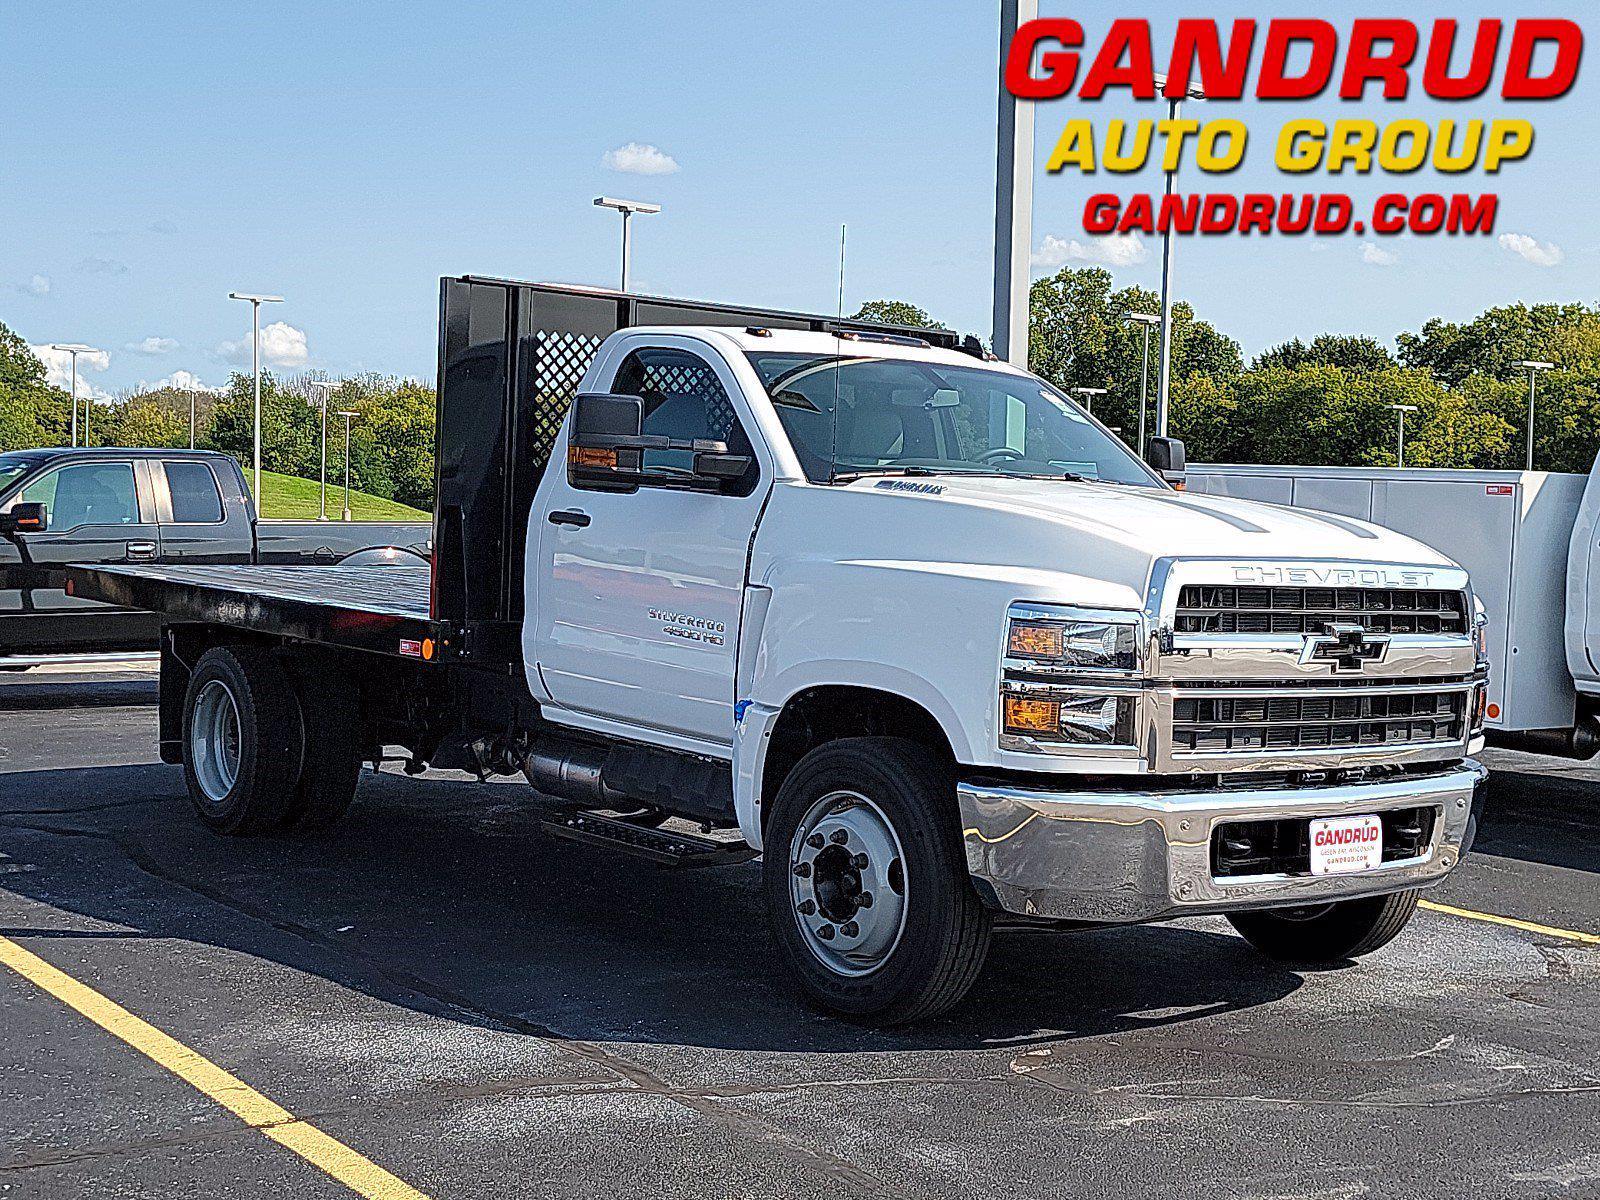 2021 Silverado 4500 Regular Cab DRW 4x2,  Monroe Truck Equipment Platform Body #M1601 - photo 1